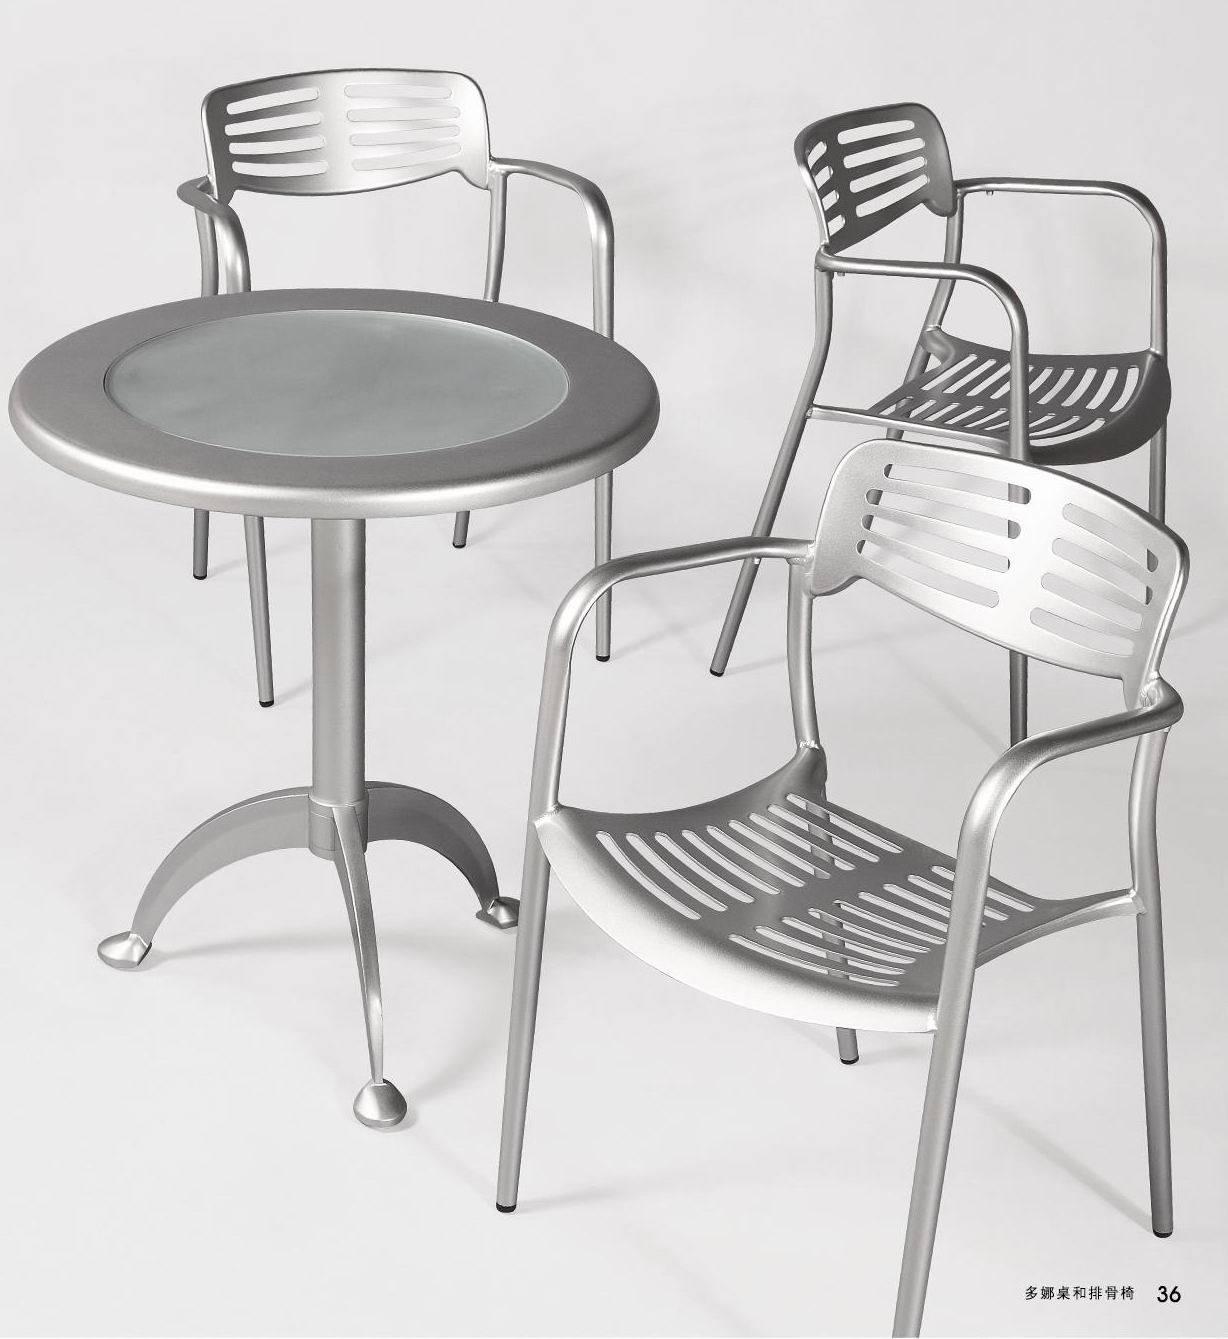 aluminio muebles de terraza aluminio muebles de terraza